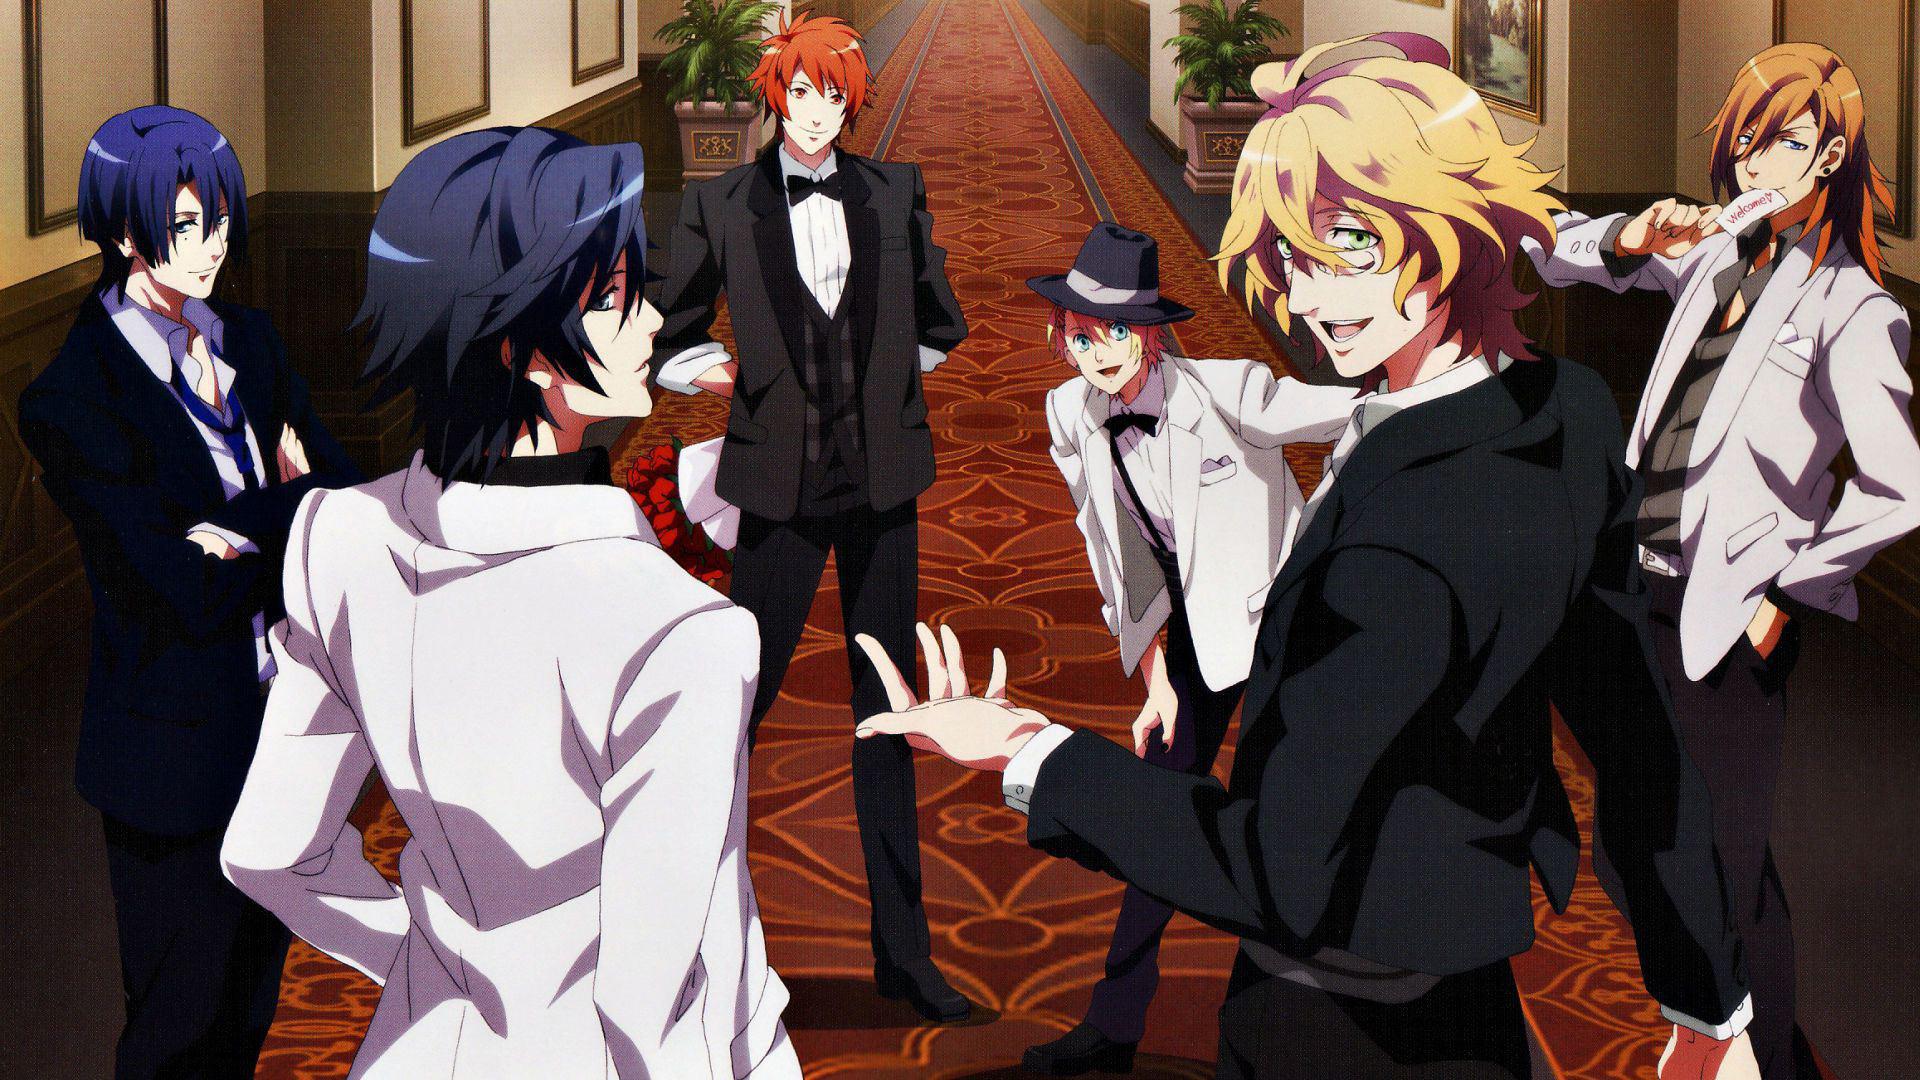 Anime Поющий принц: Реально 1000% любовь